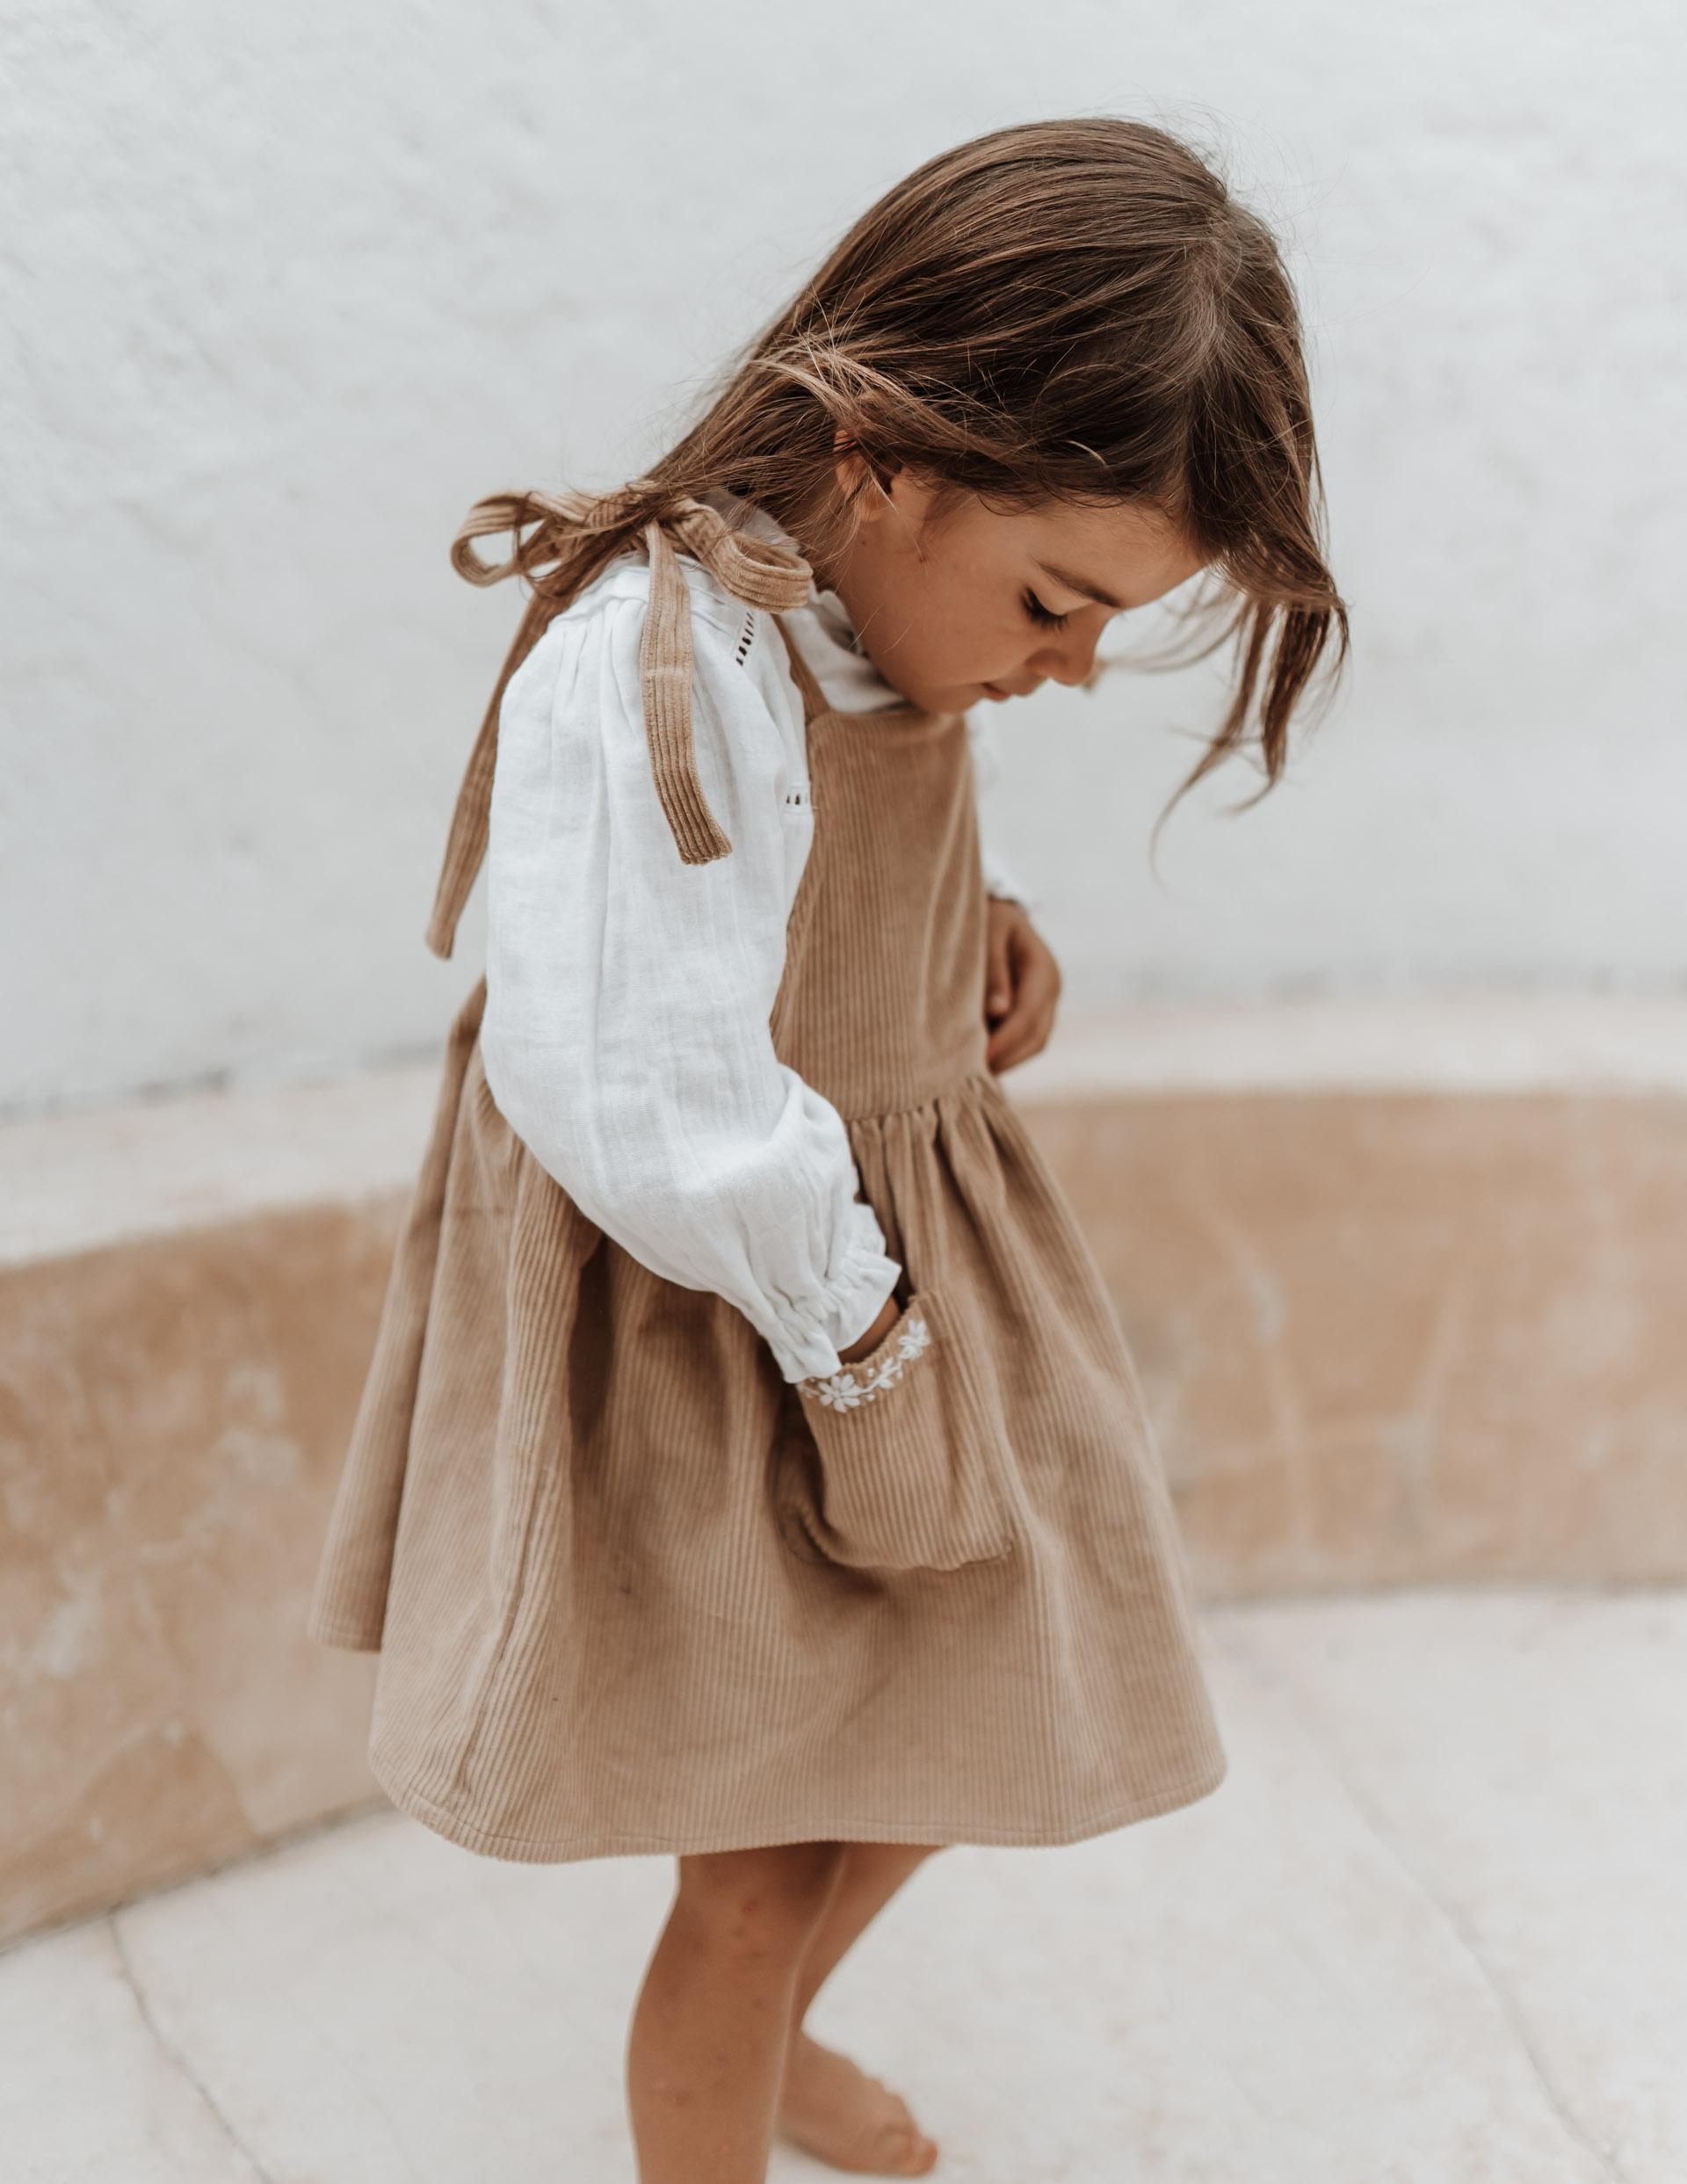 keira-mason-illoura-the-label-girl-reaching-into-pocket.jpg